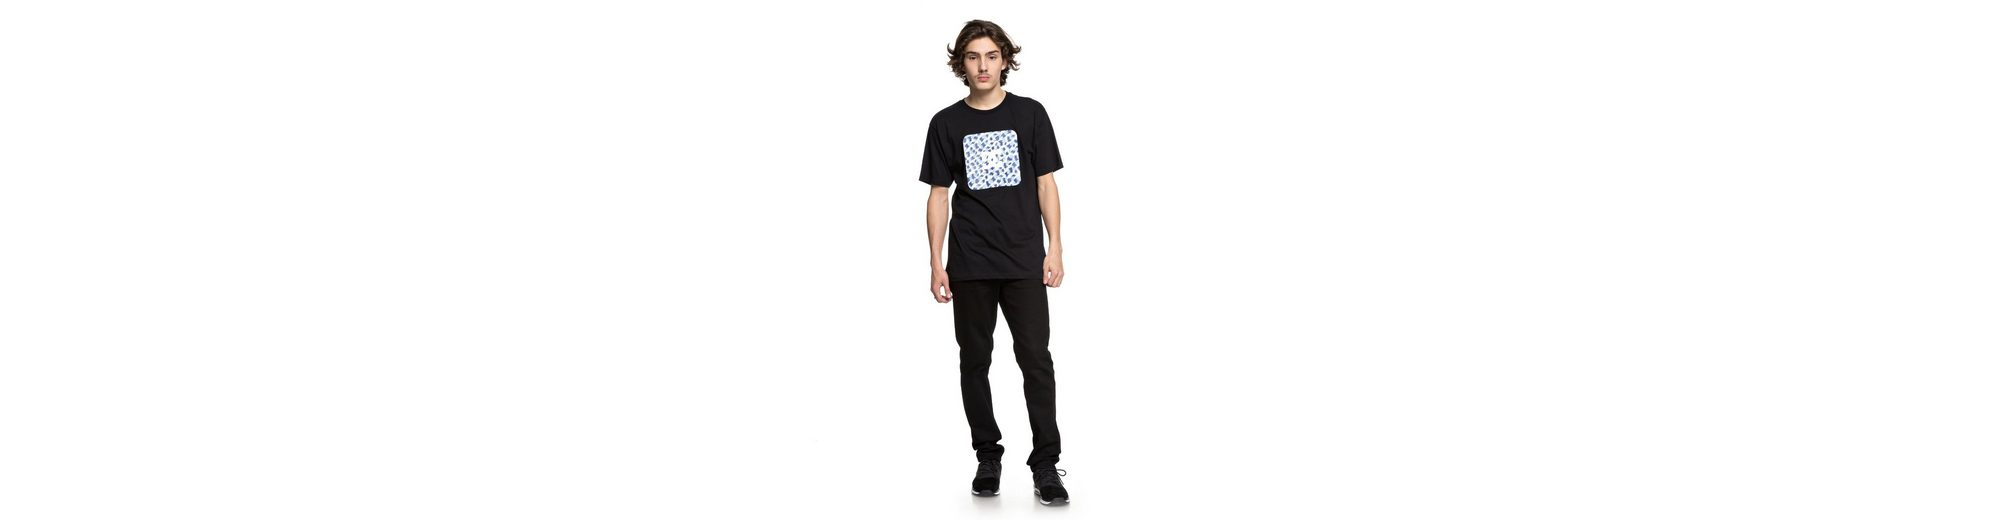 DC Shoes Slim Fit Jeans Worker Black Rinse Billig Verkaufen Große Überraschung cLRlq